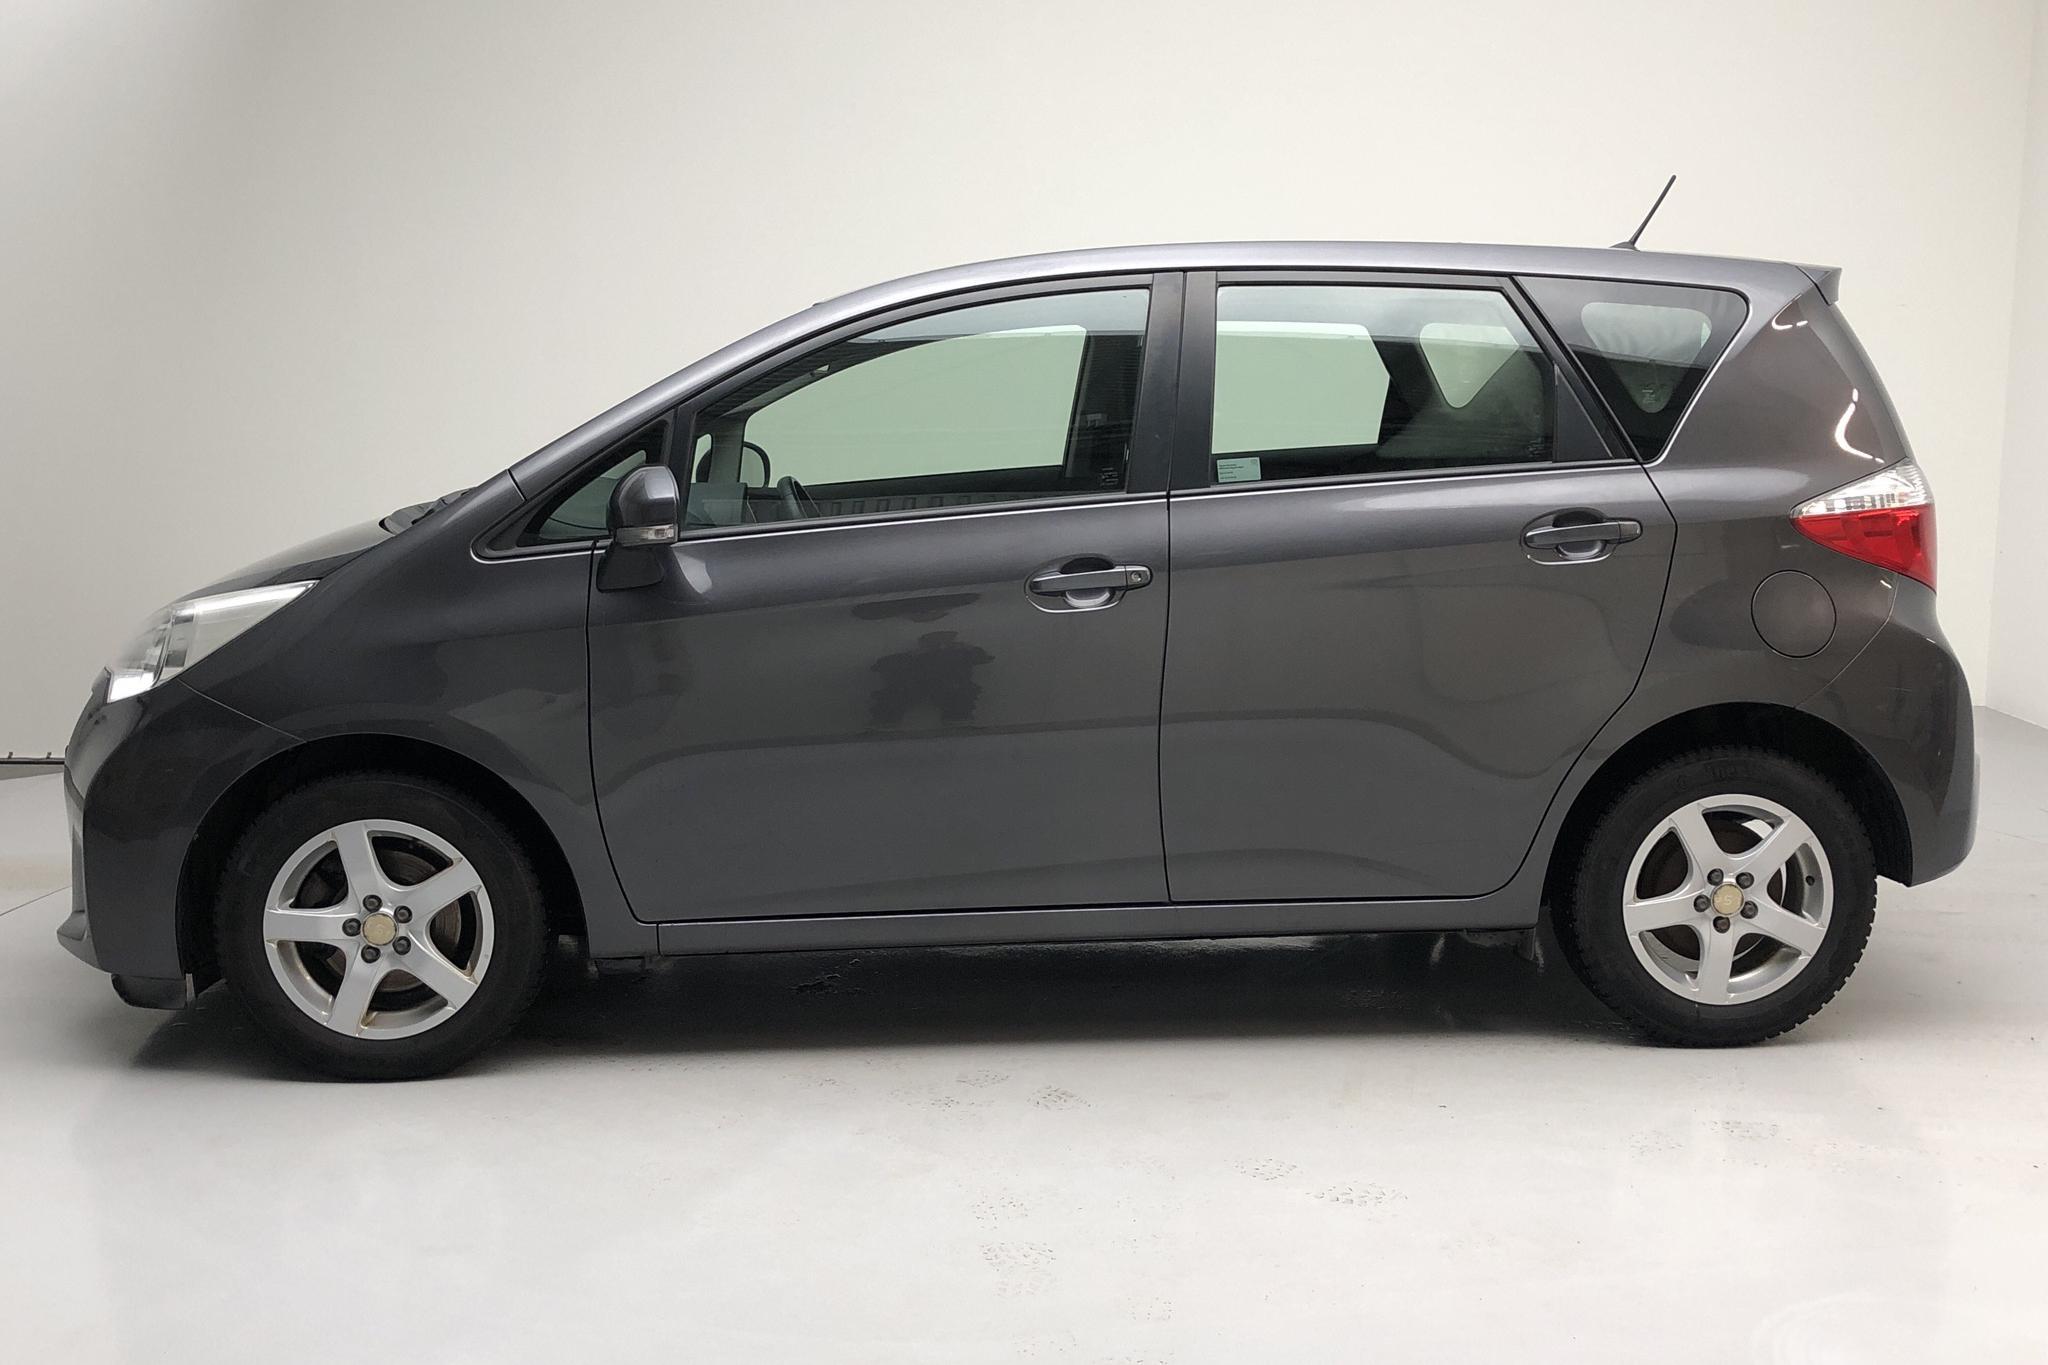 Toyota Verso S 1.33 (99hk) - 12 712 mil - Manuell - Dark Grey - 2012